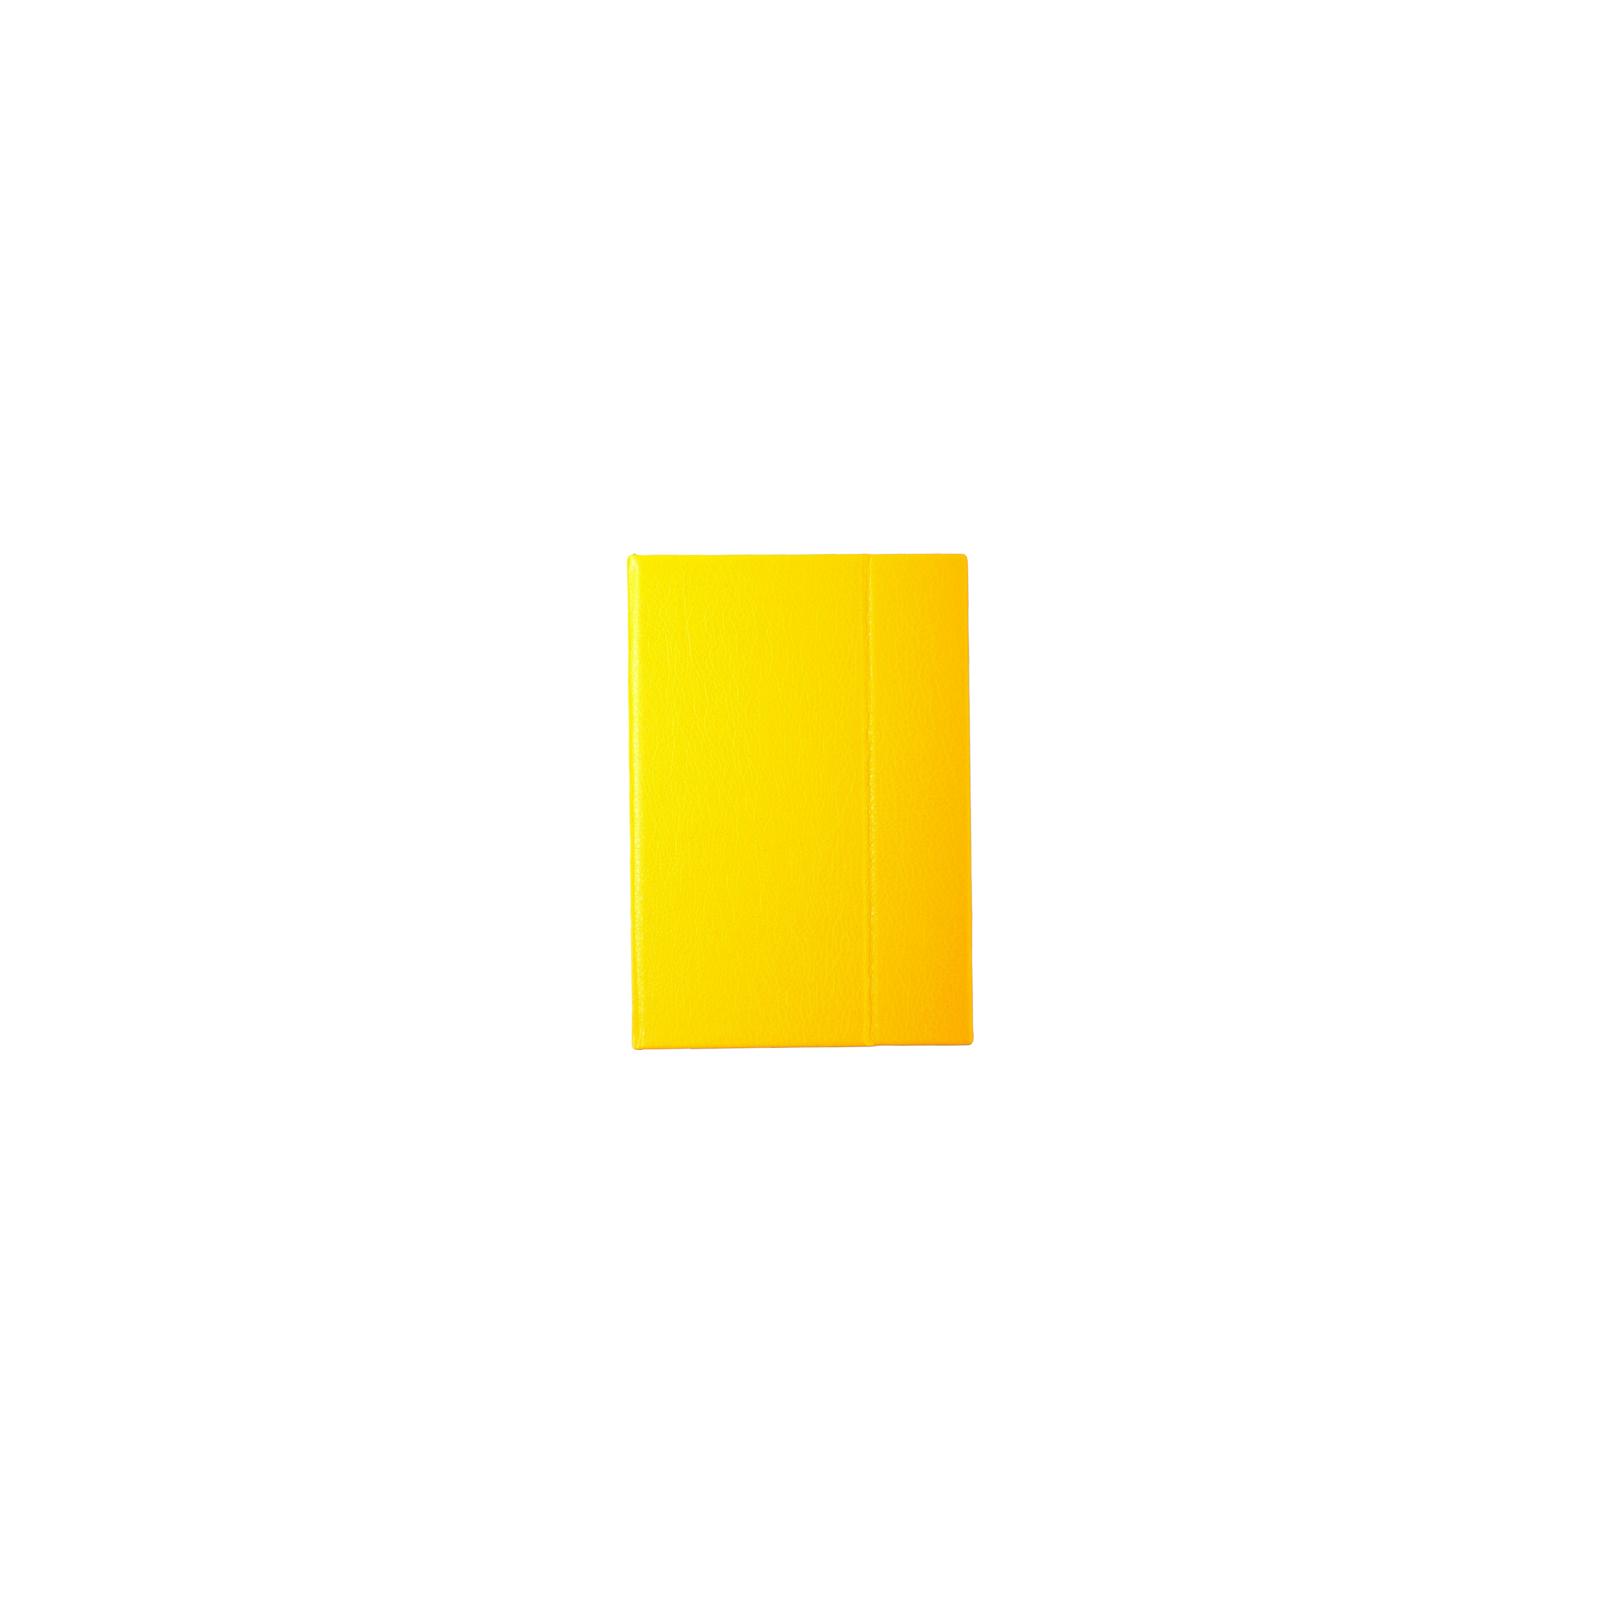 Чехол для планшета Vento 8 Desire Bright -yellow изображение 2